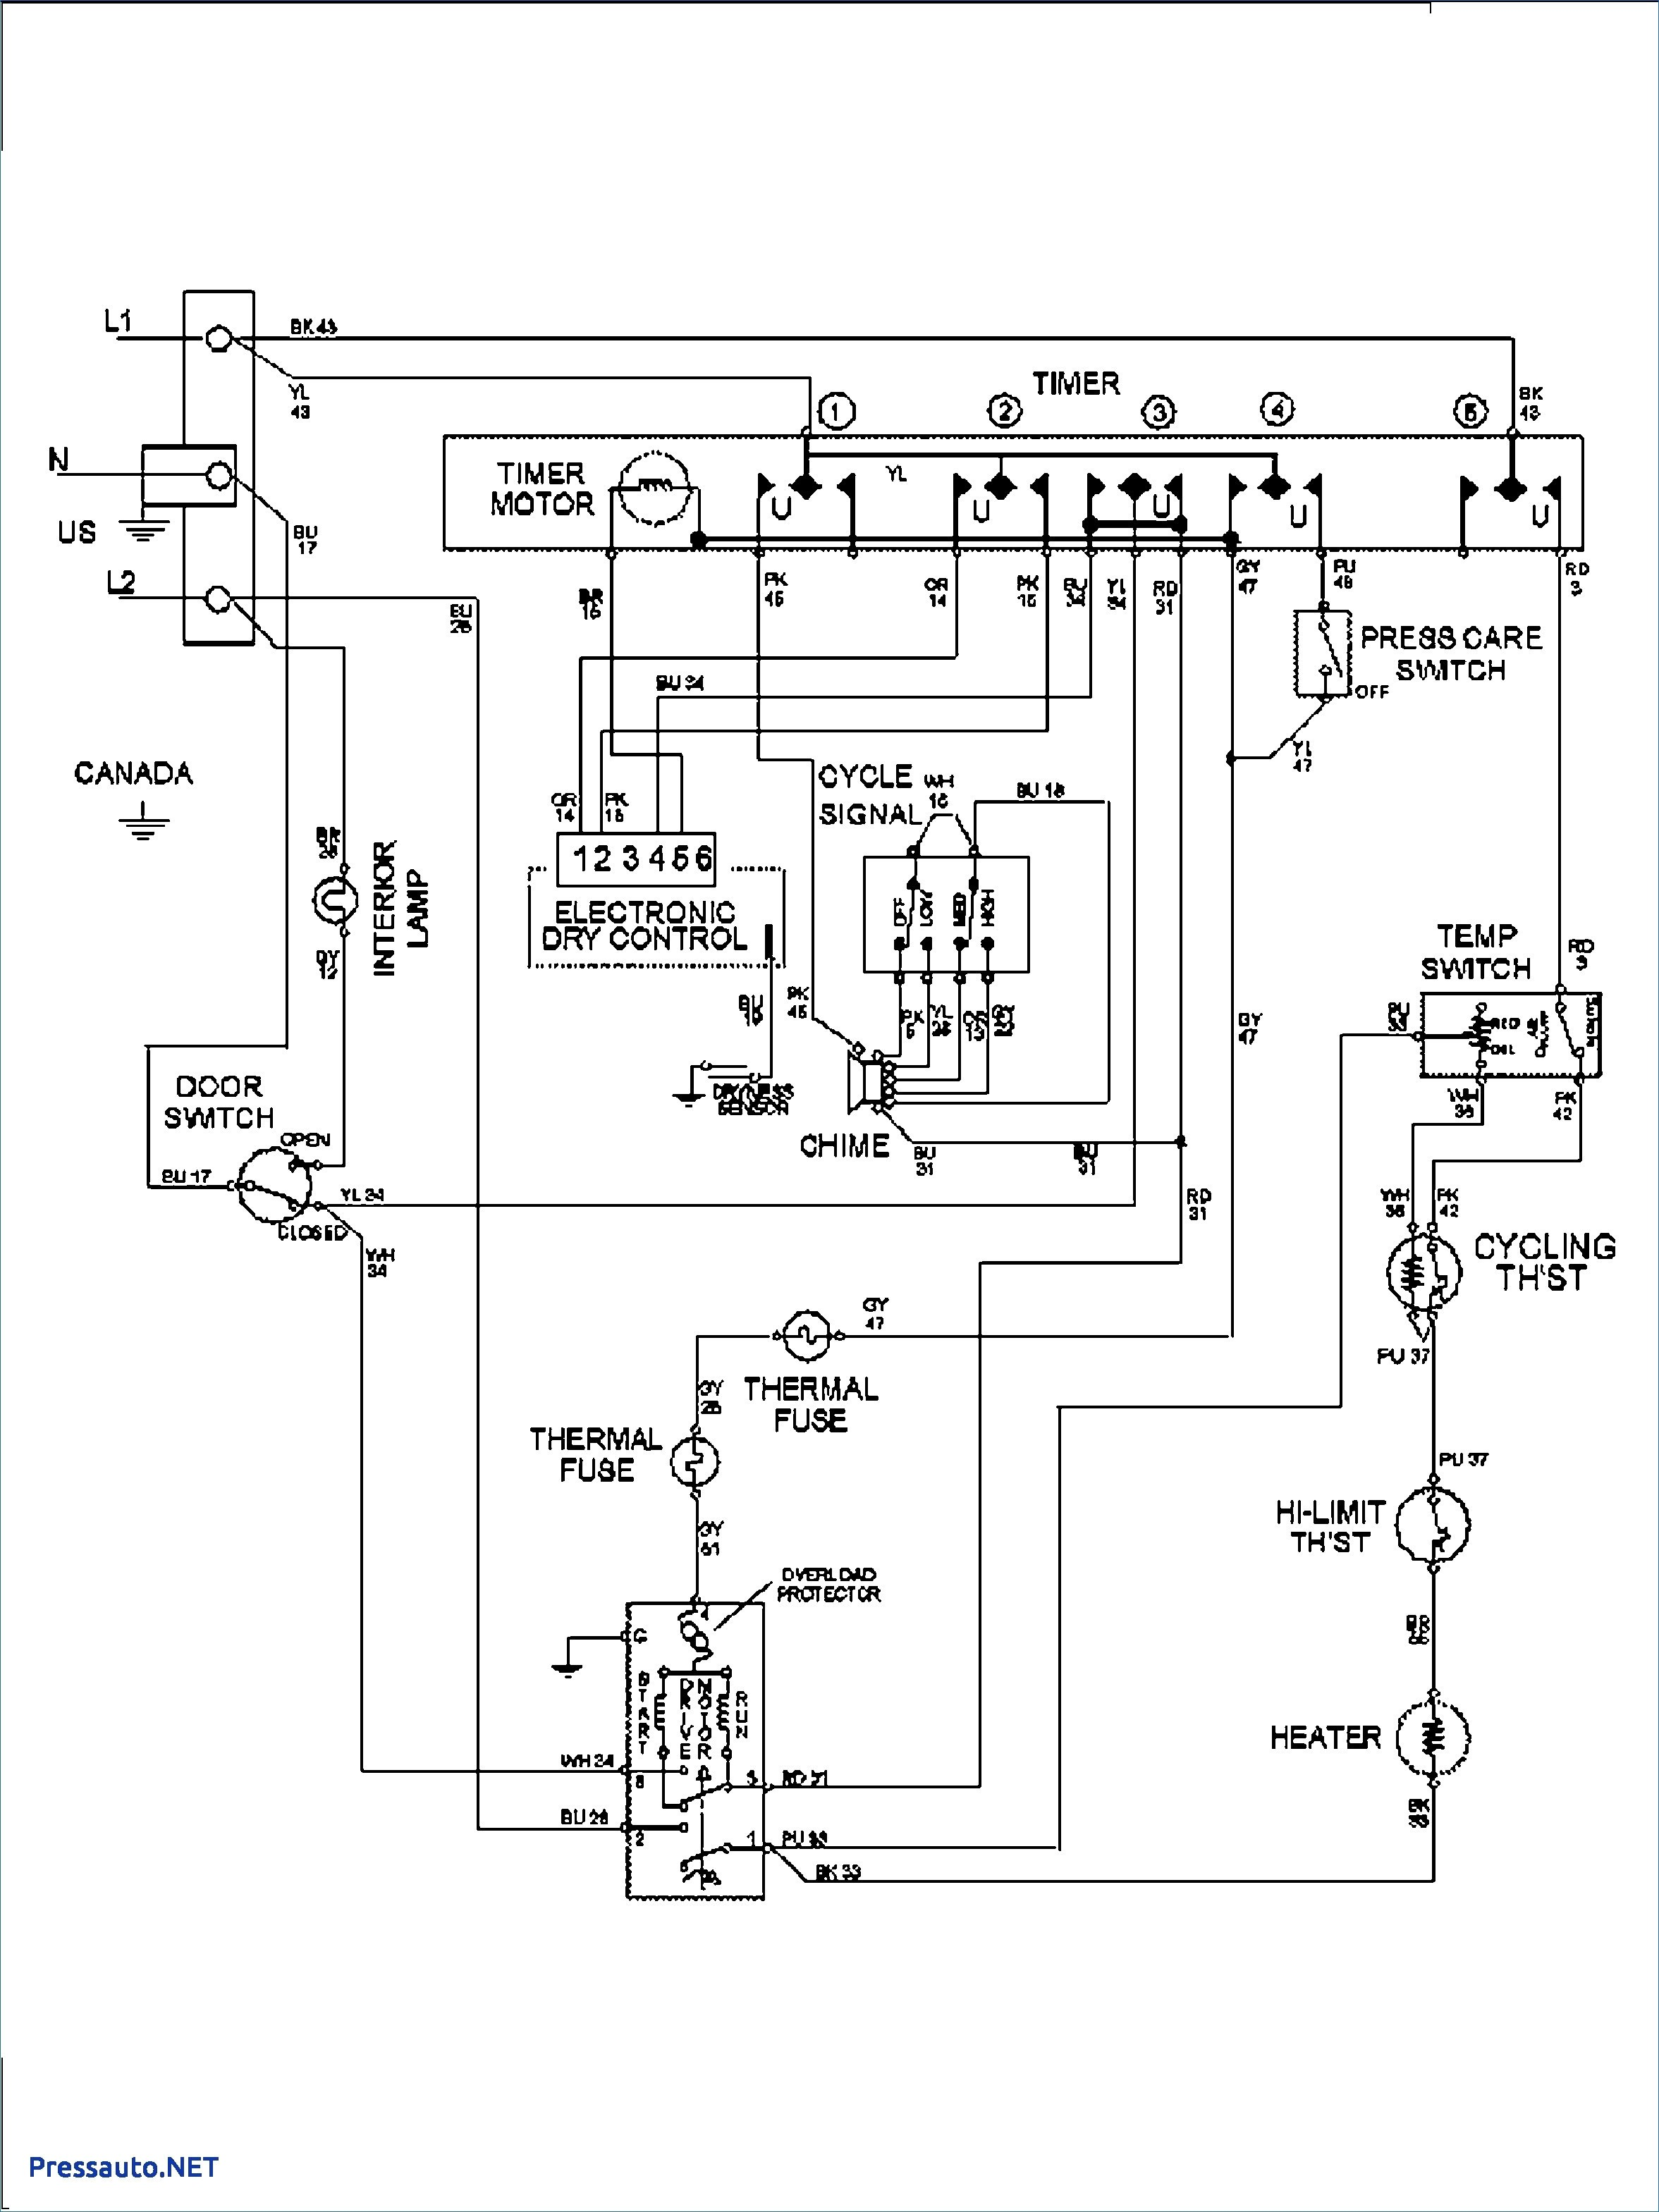 Wiring Diagram for Maytag Dryer Wiring Diagram for Maytag Dryer Simplified Shapes Maytag Washer Of Wiring Diagram for Maytag Dryer